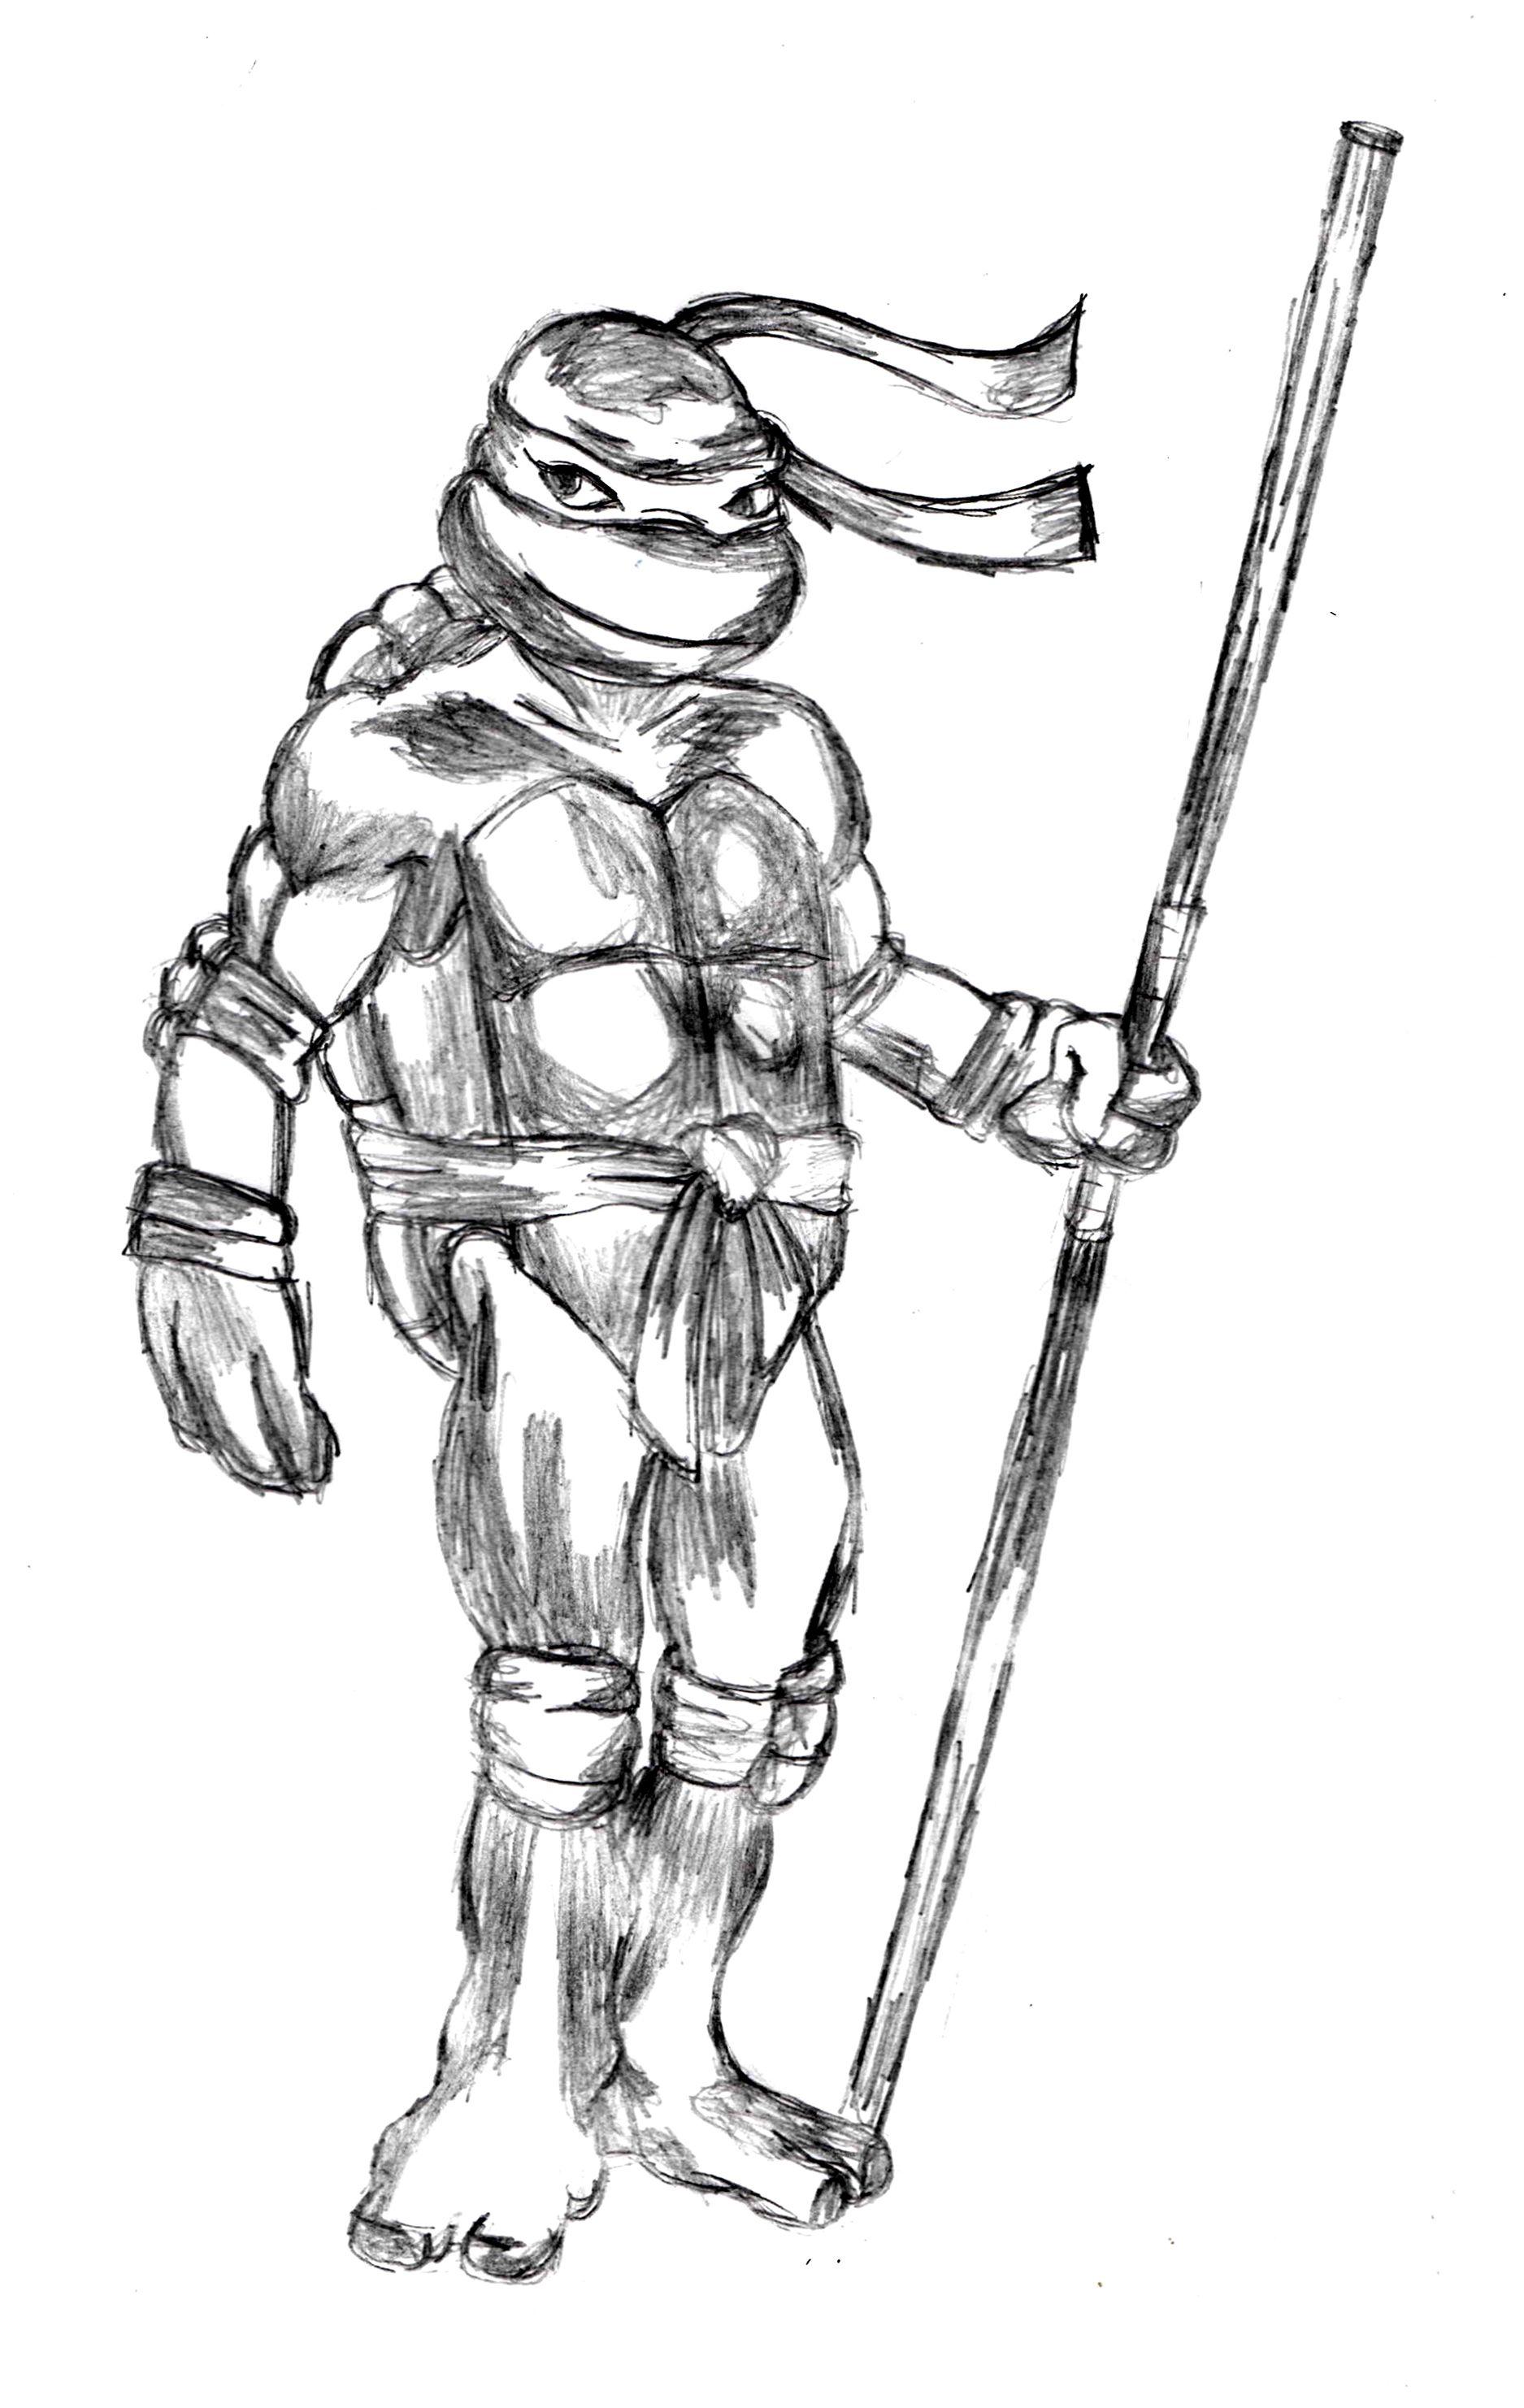 Donatello sketch http://drawingmanuals.com/manual/how-to